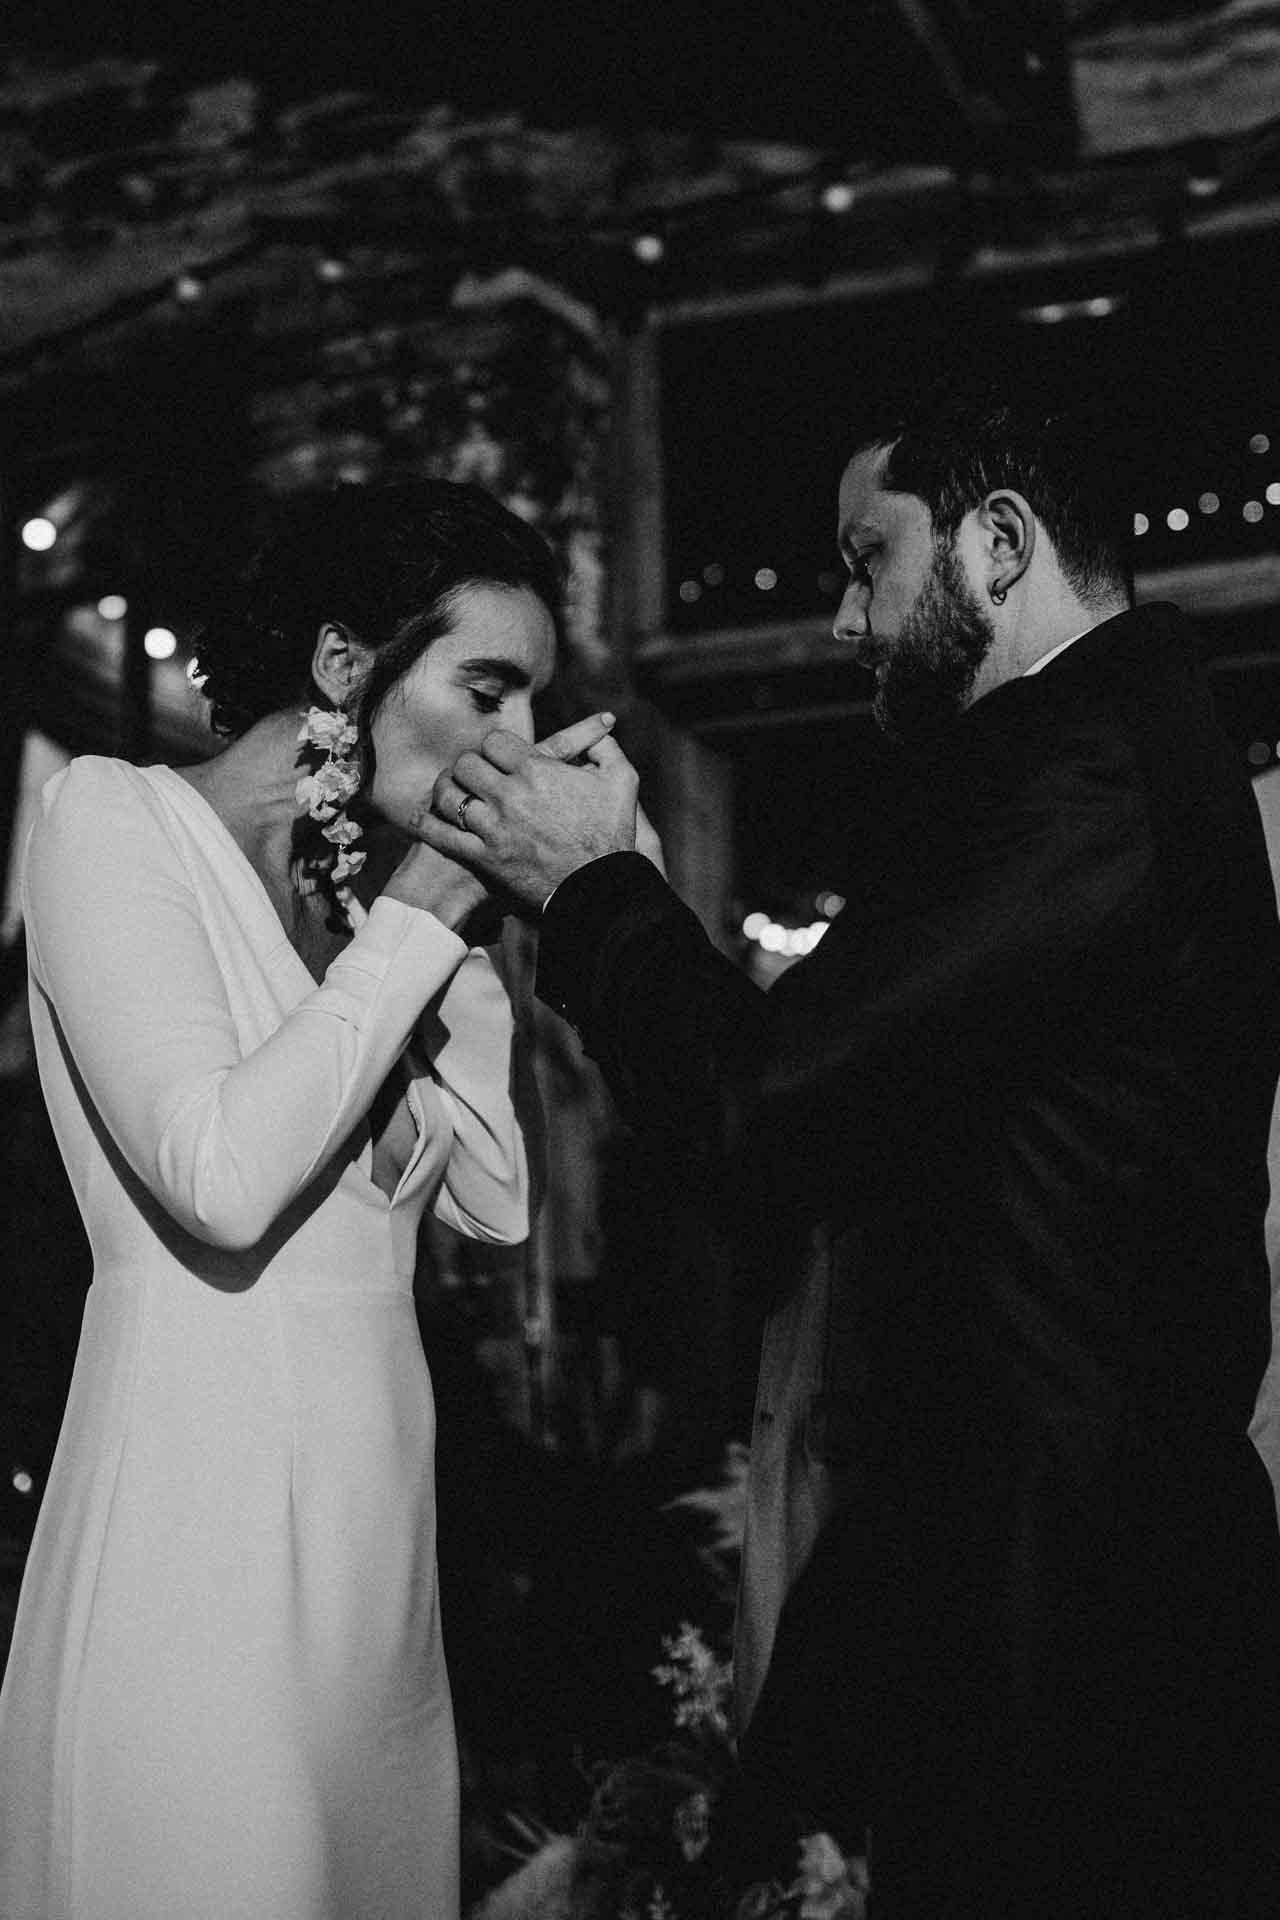 mariage maries baiser amour